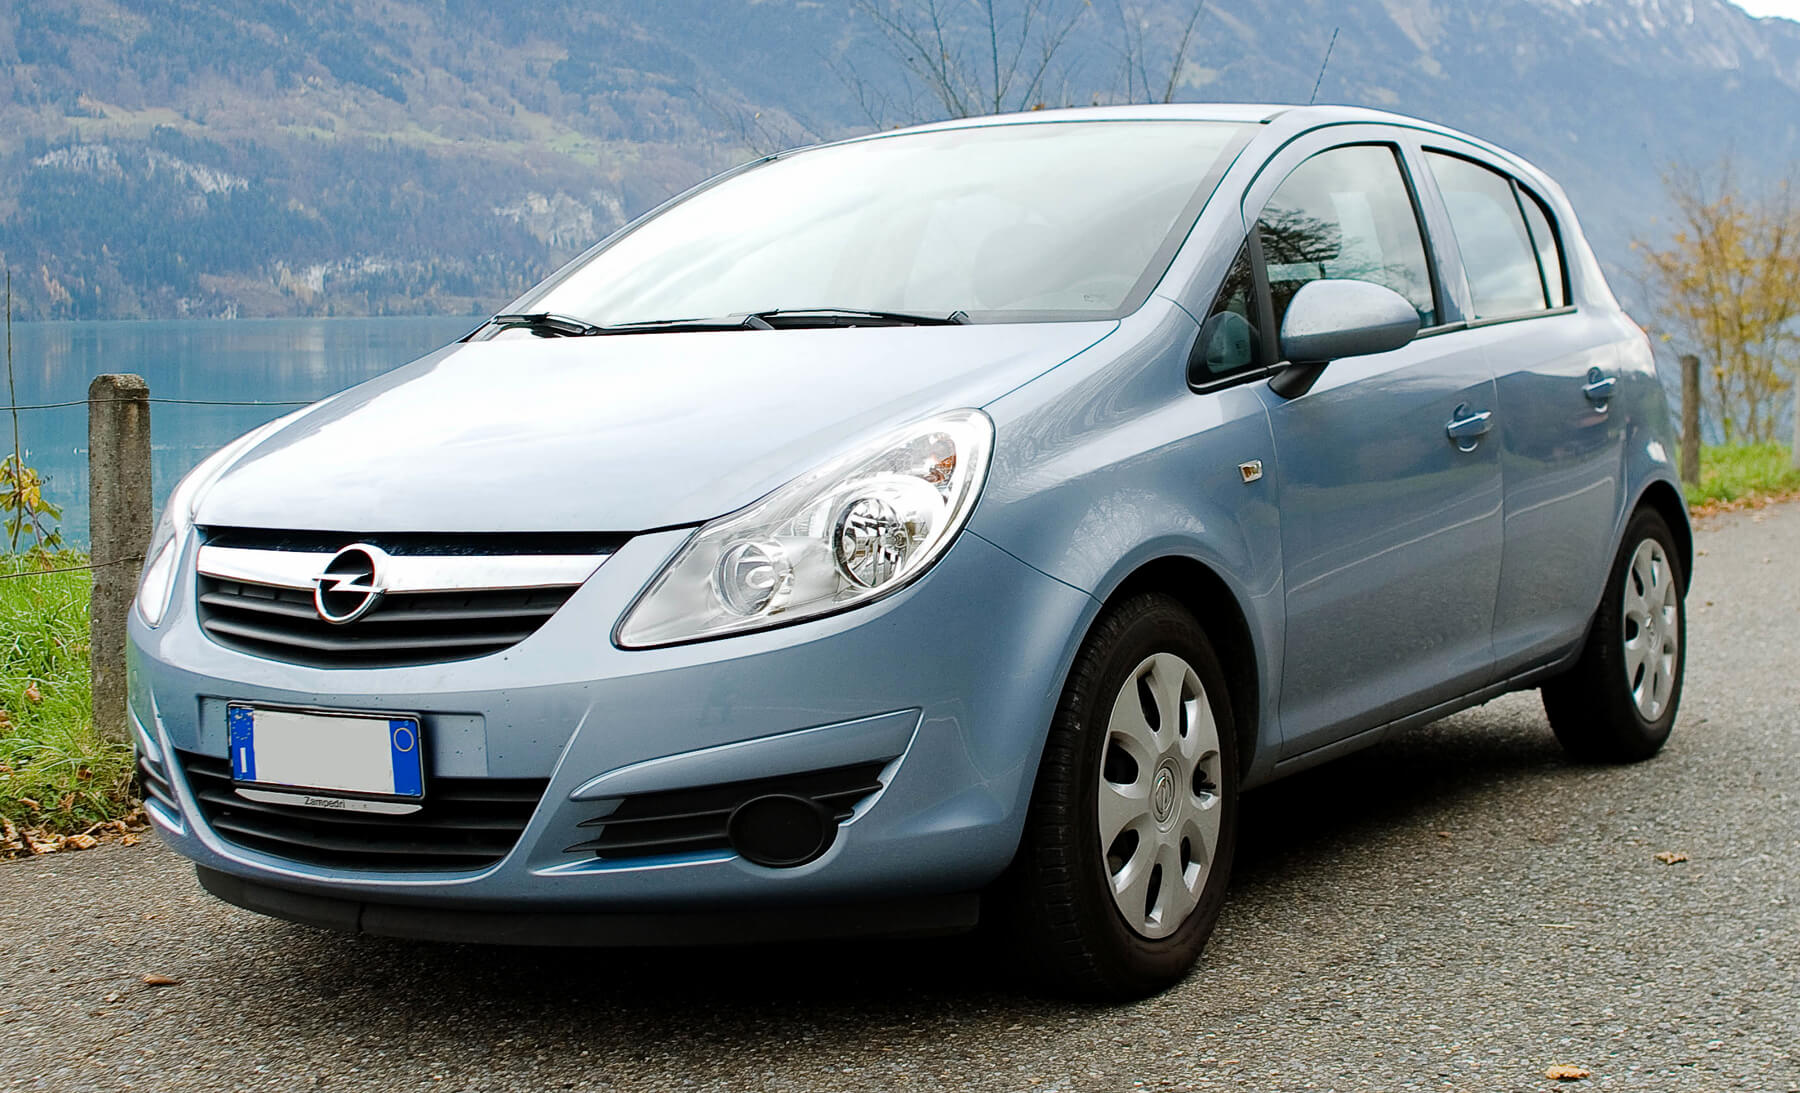 Арендованное авто Opel Corsa